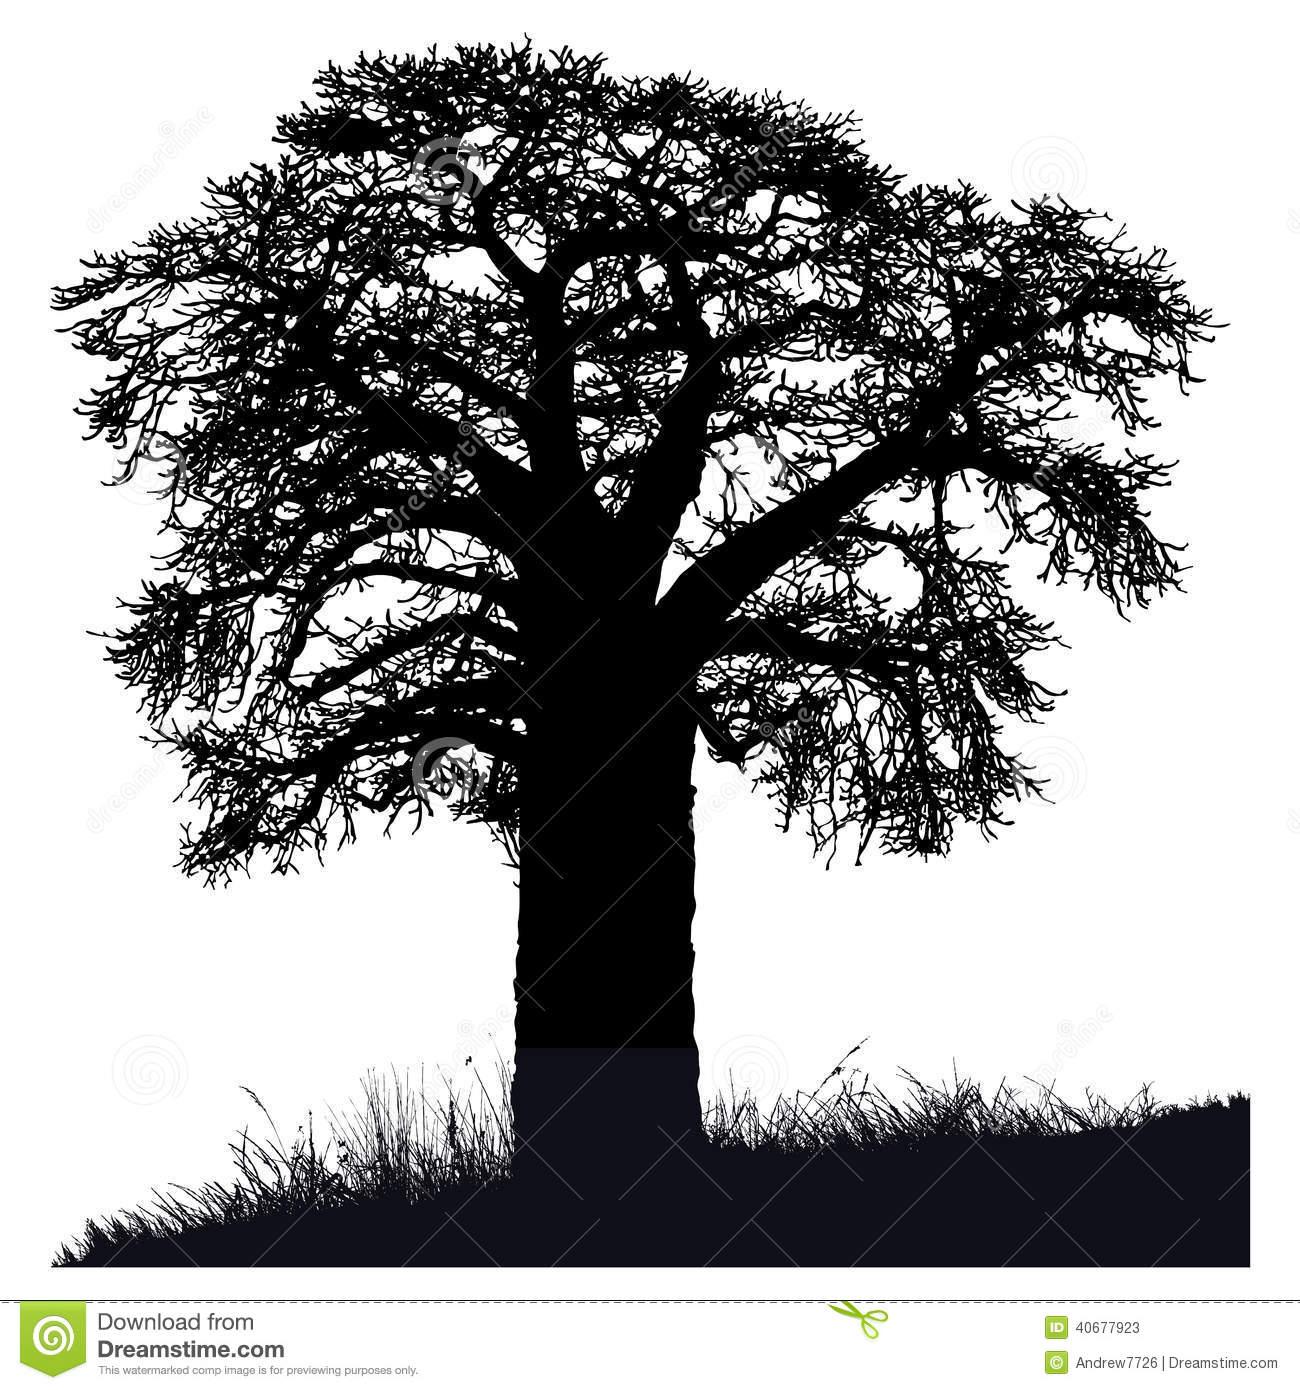 Baobab tree clipart black and white.